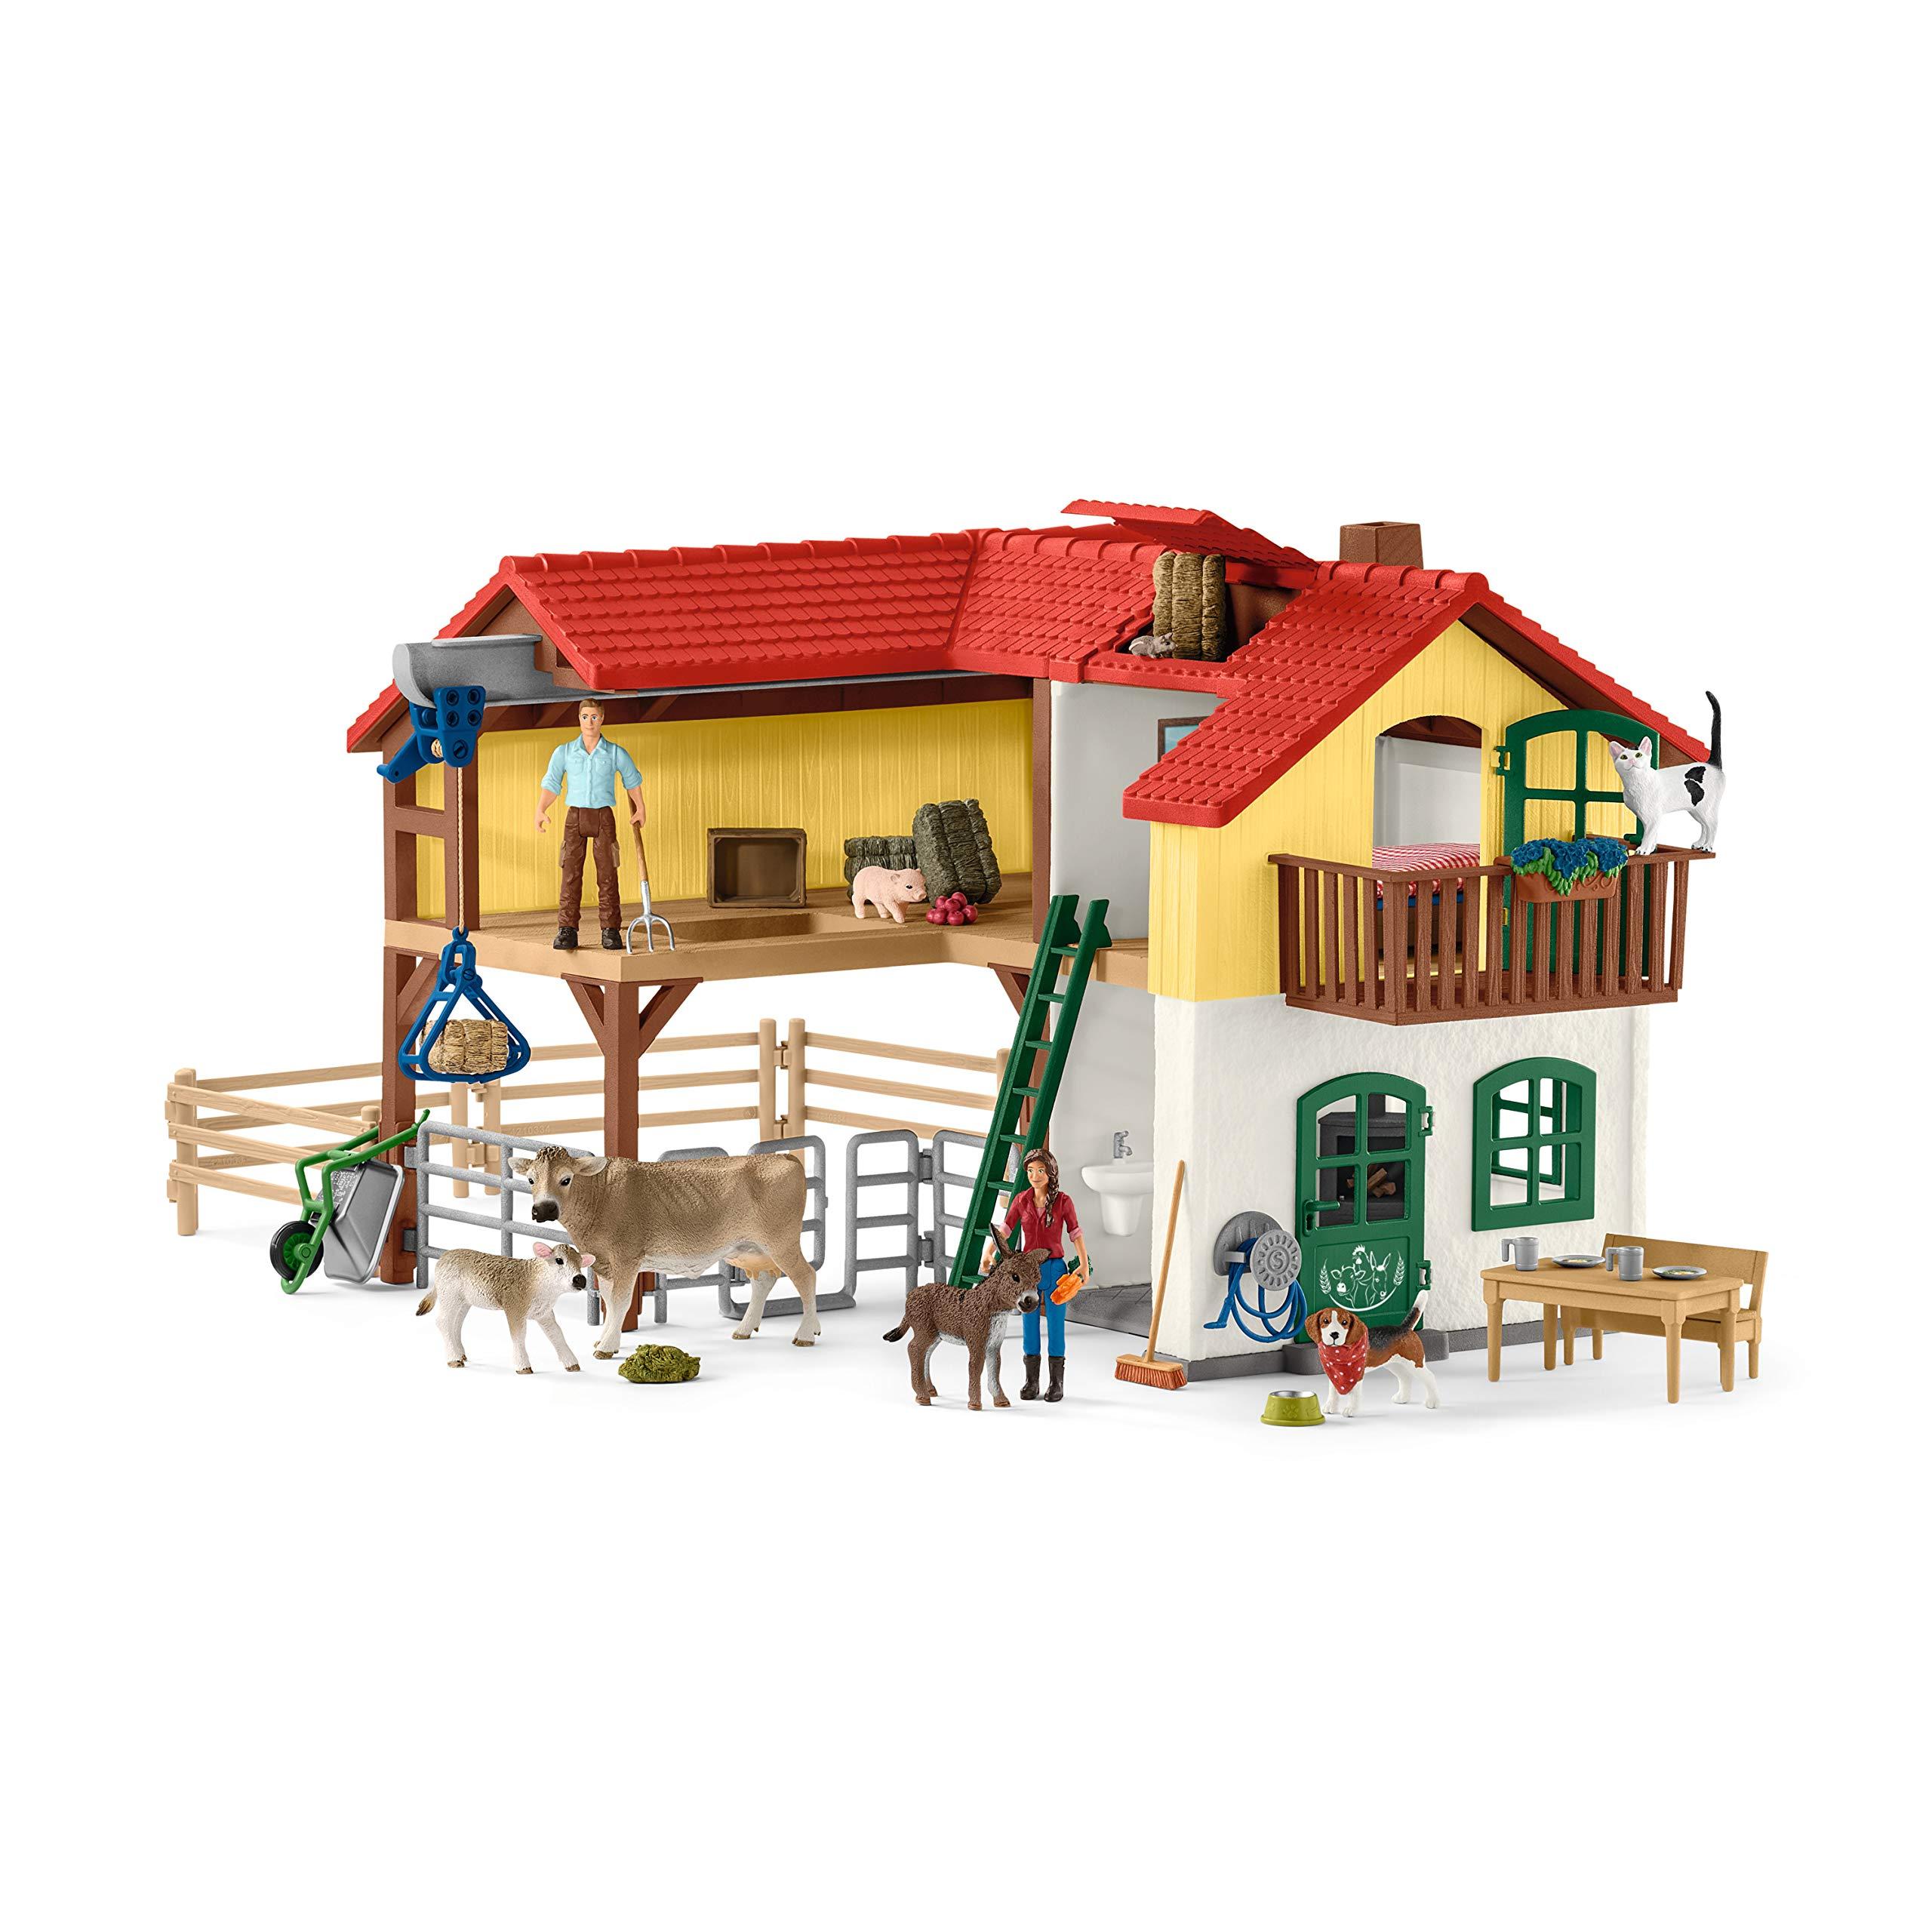 Schleich Large Farm House by Schleich (Image #2)